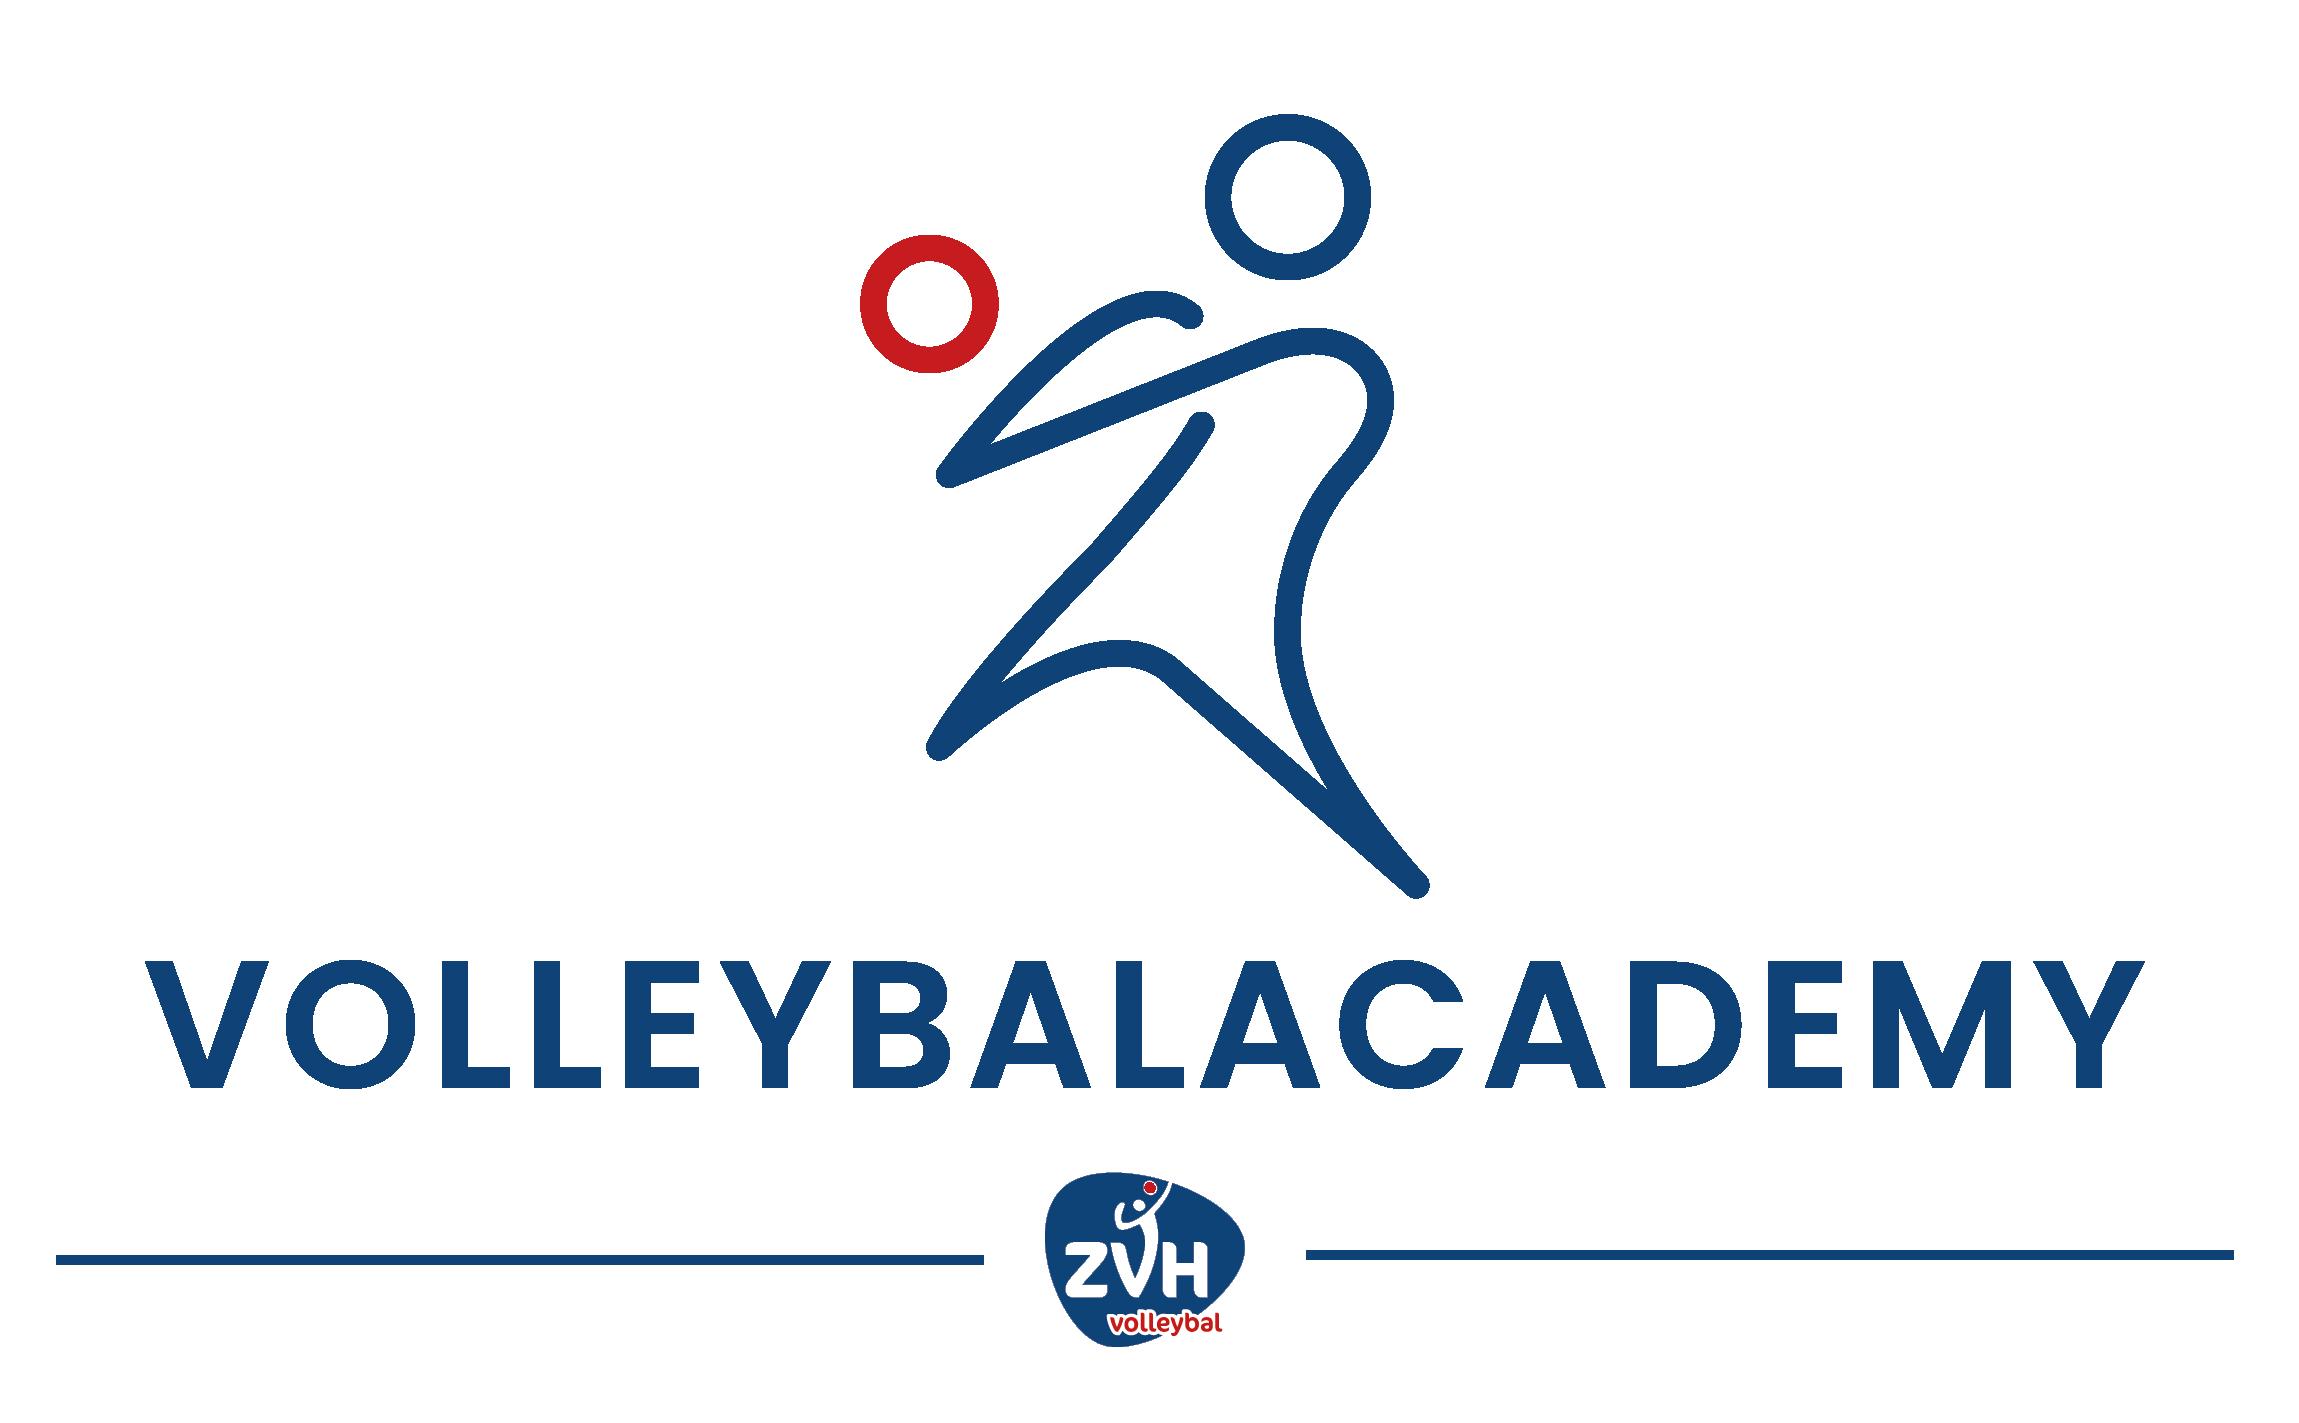 volleybalacademyzvh